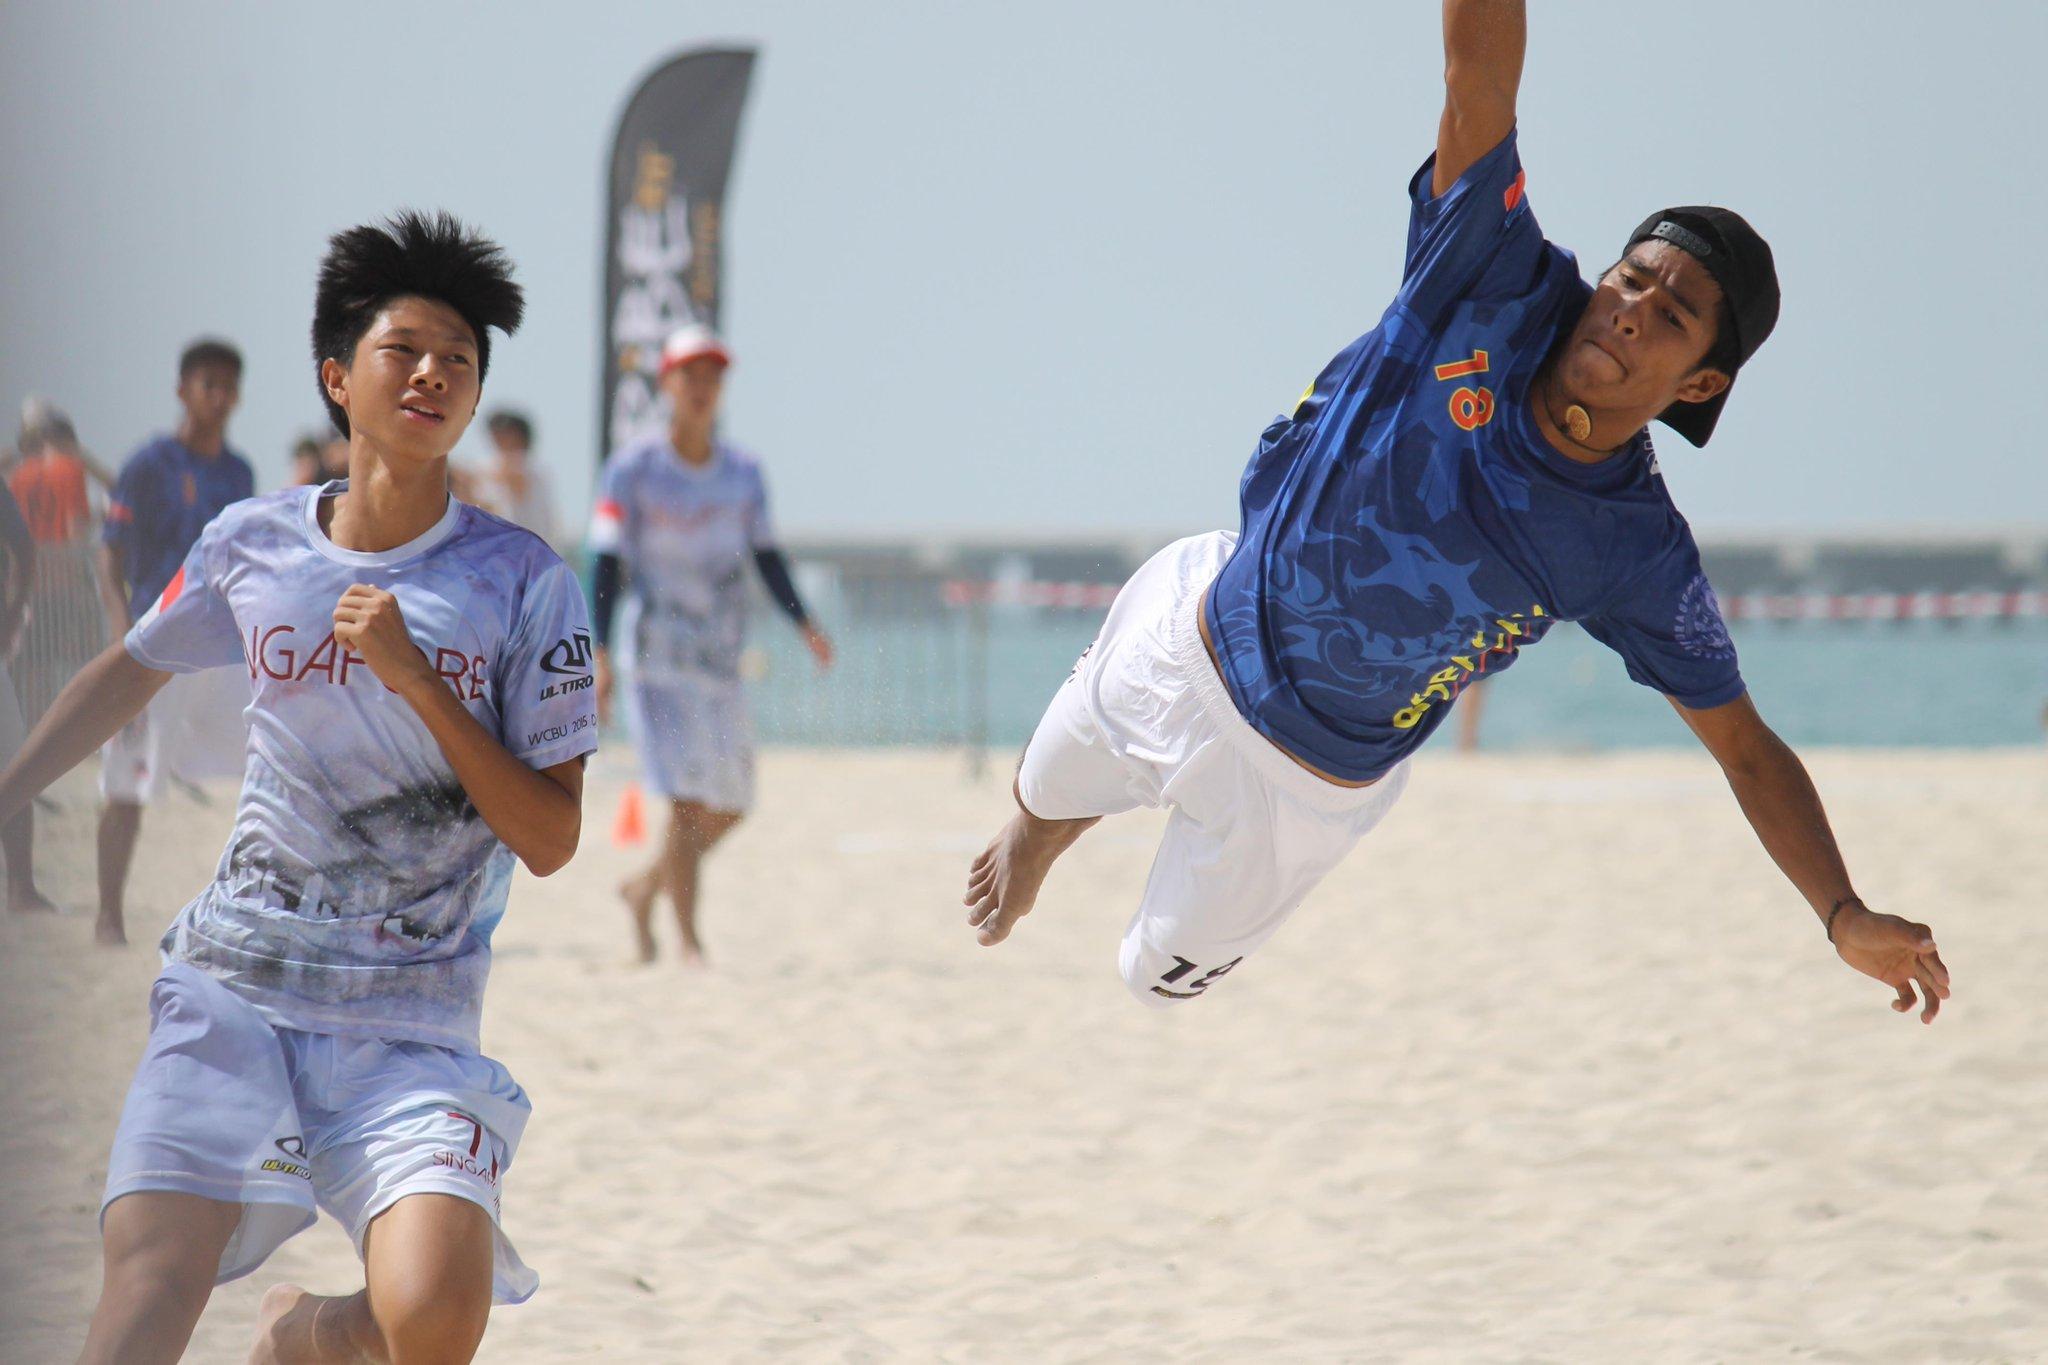 #WCBU2015 All action in Dubai http://t.co/TRwTKTRBQQ <a href='http://twitter.com/duncanebradbury/status/578104136715014144/photo/1' target='_blank'>See original »</a>